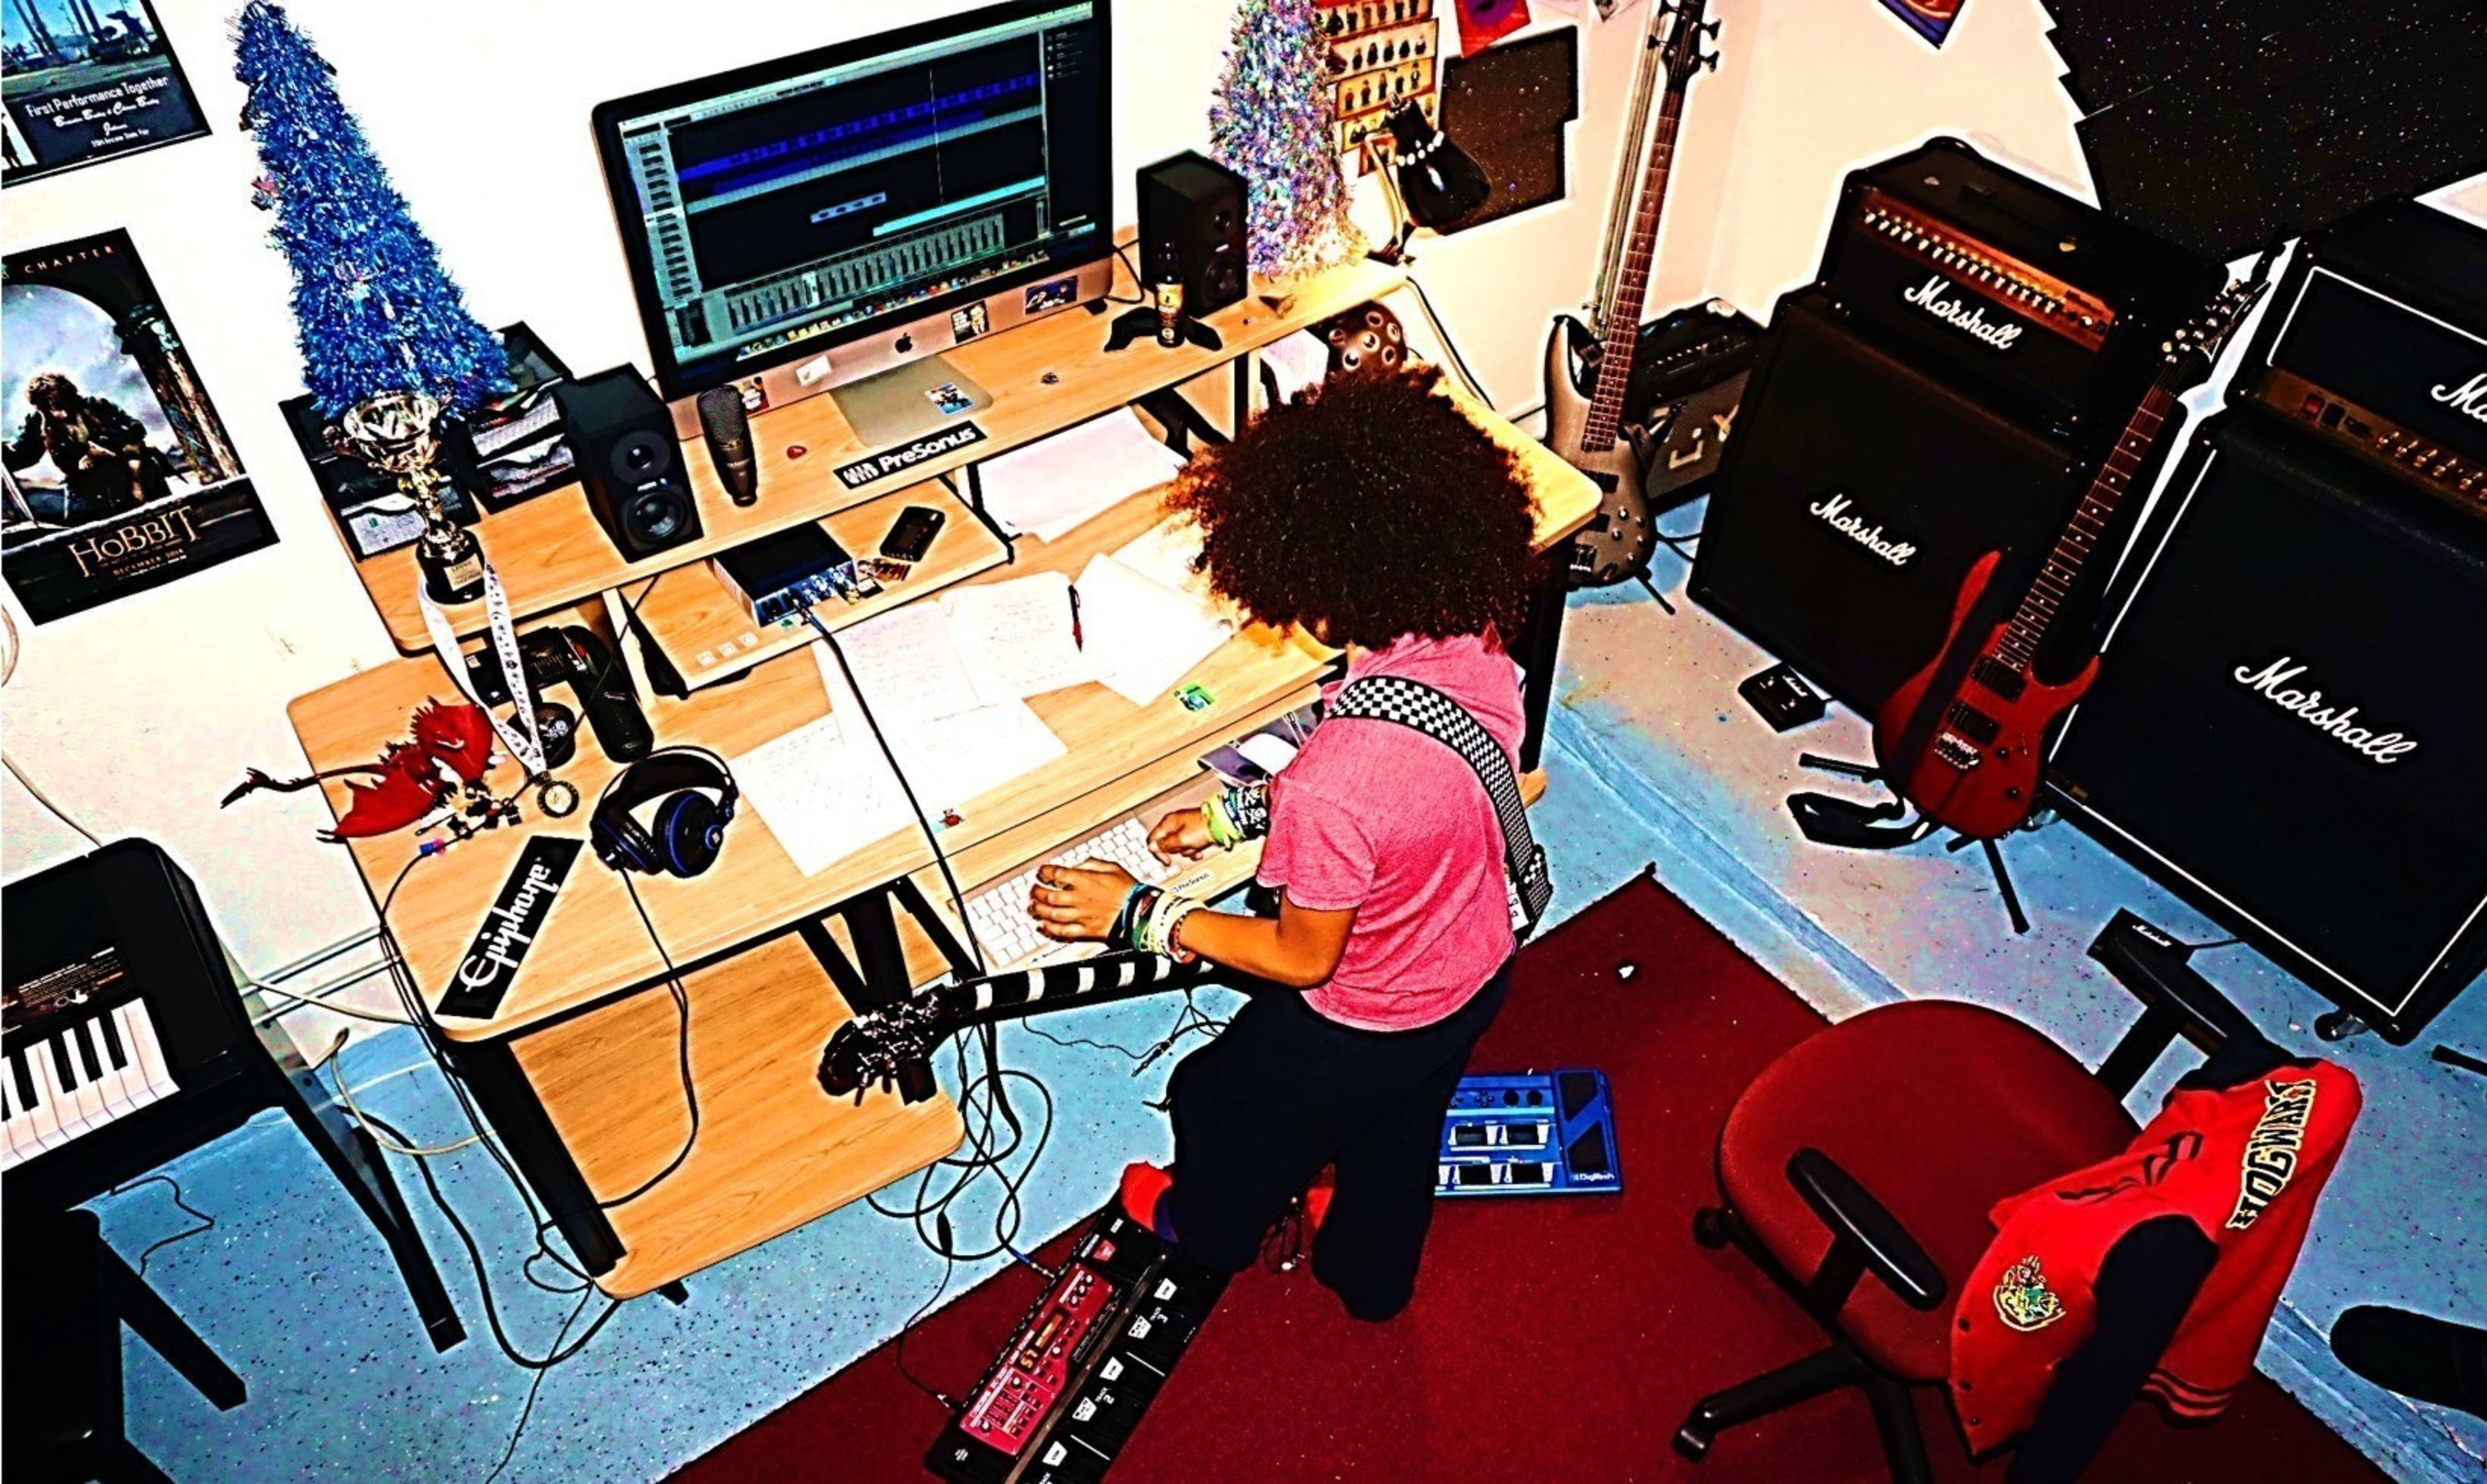 Brandon Bailey Johnson Producing in his studio